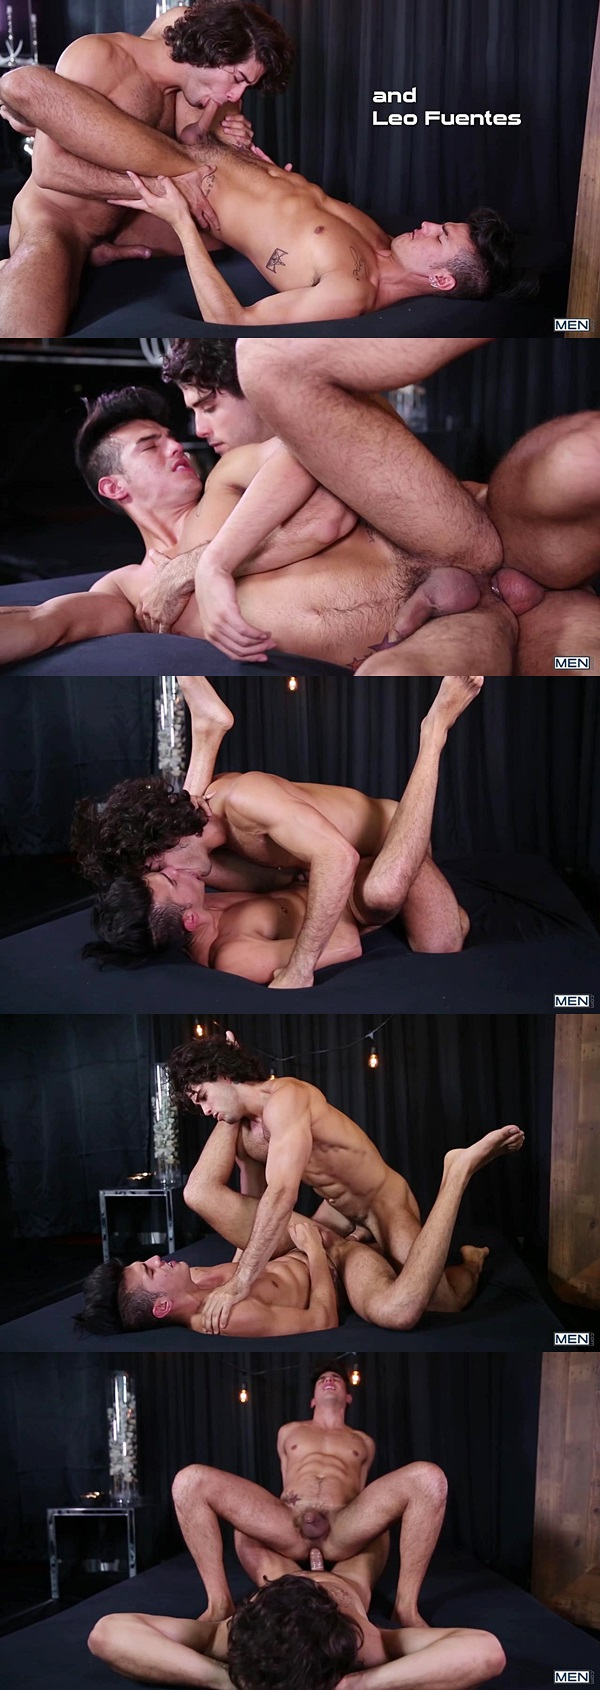 Diego Sans fucks hot newcomer Leo Fuentes at Men